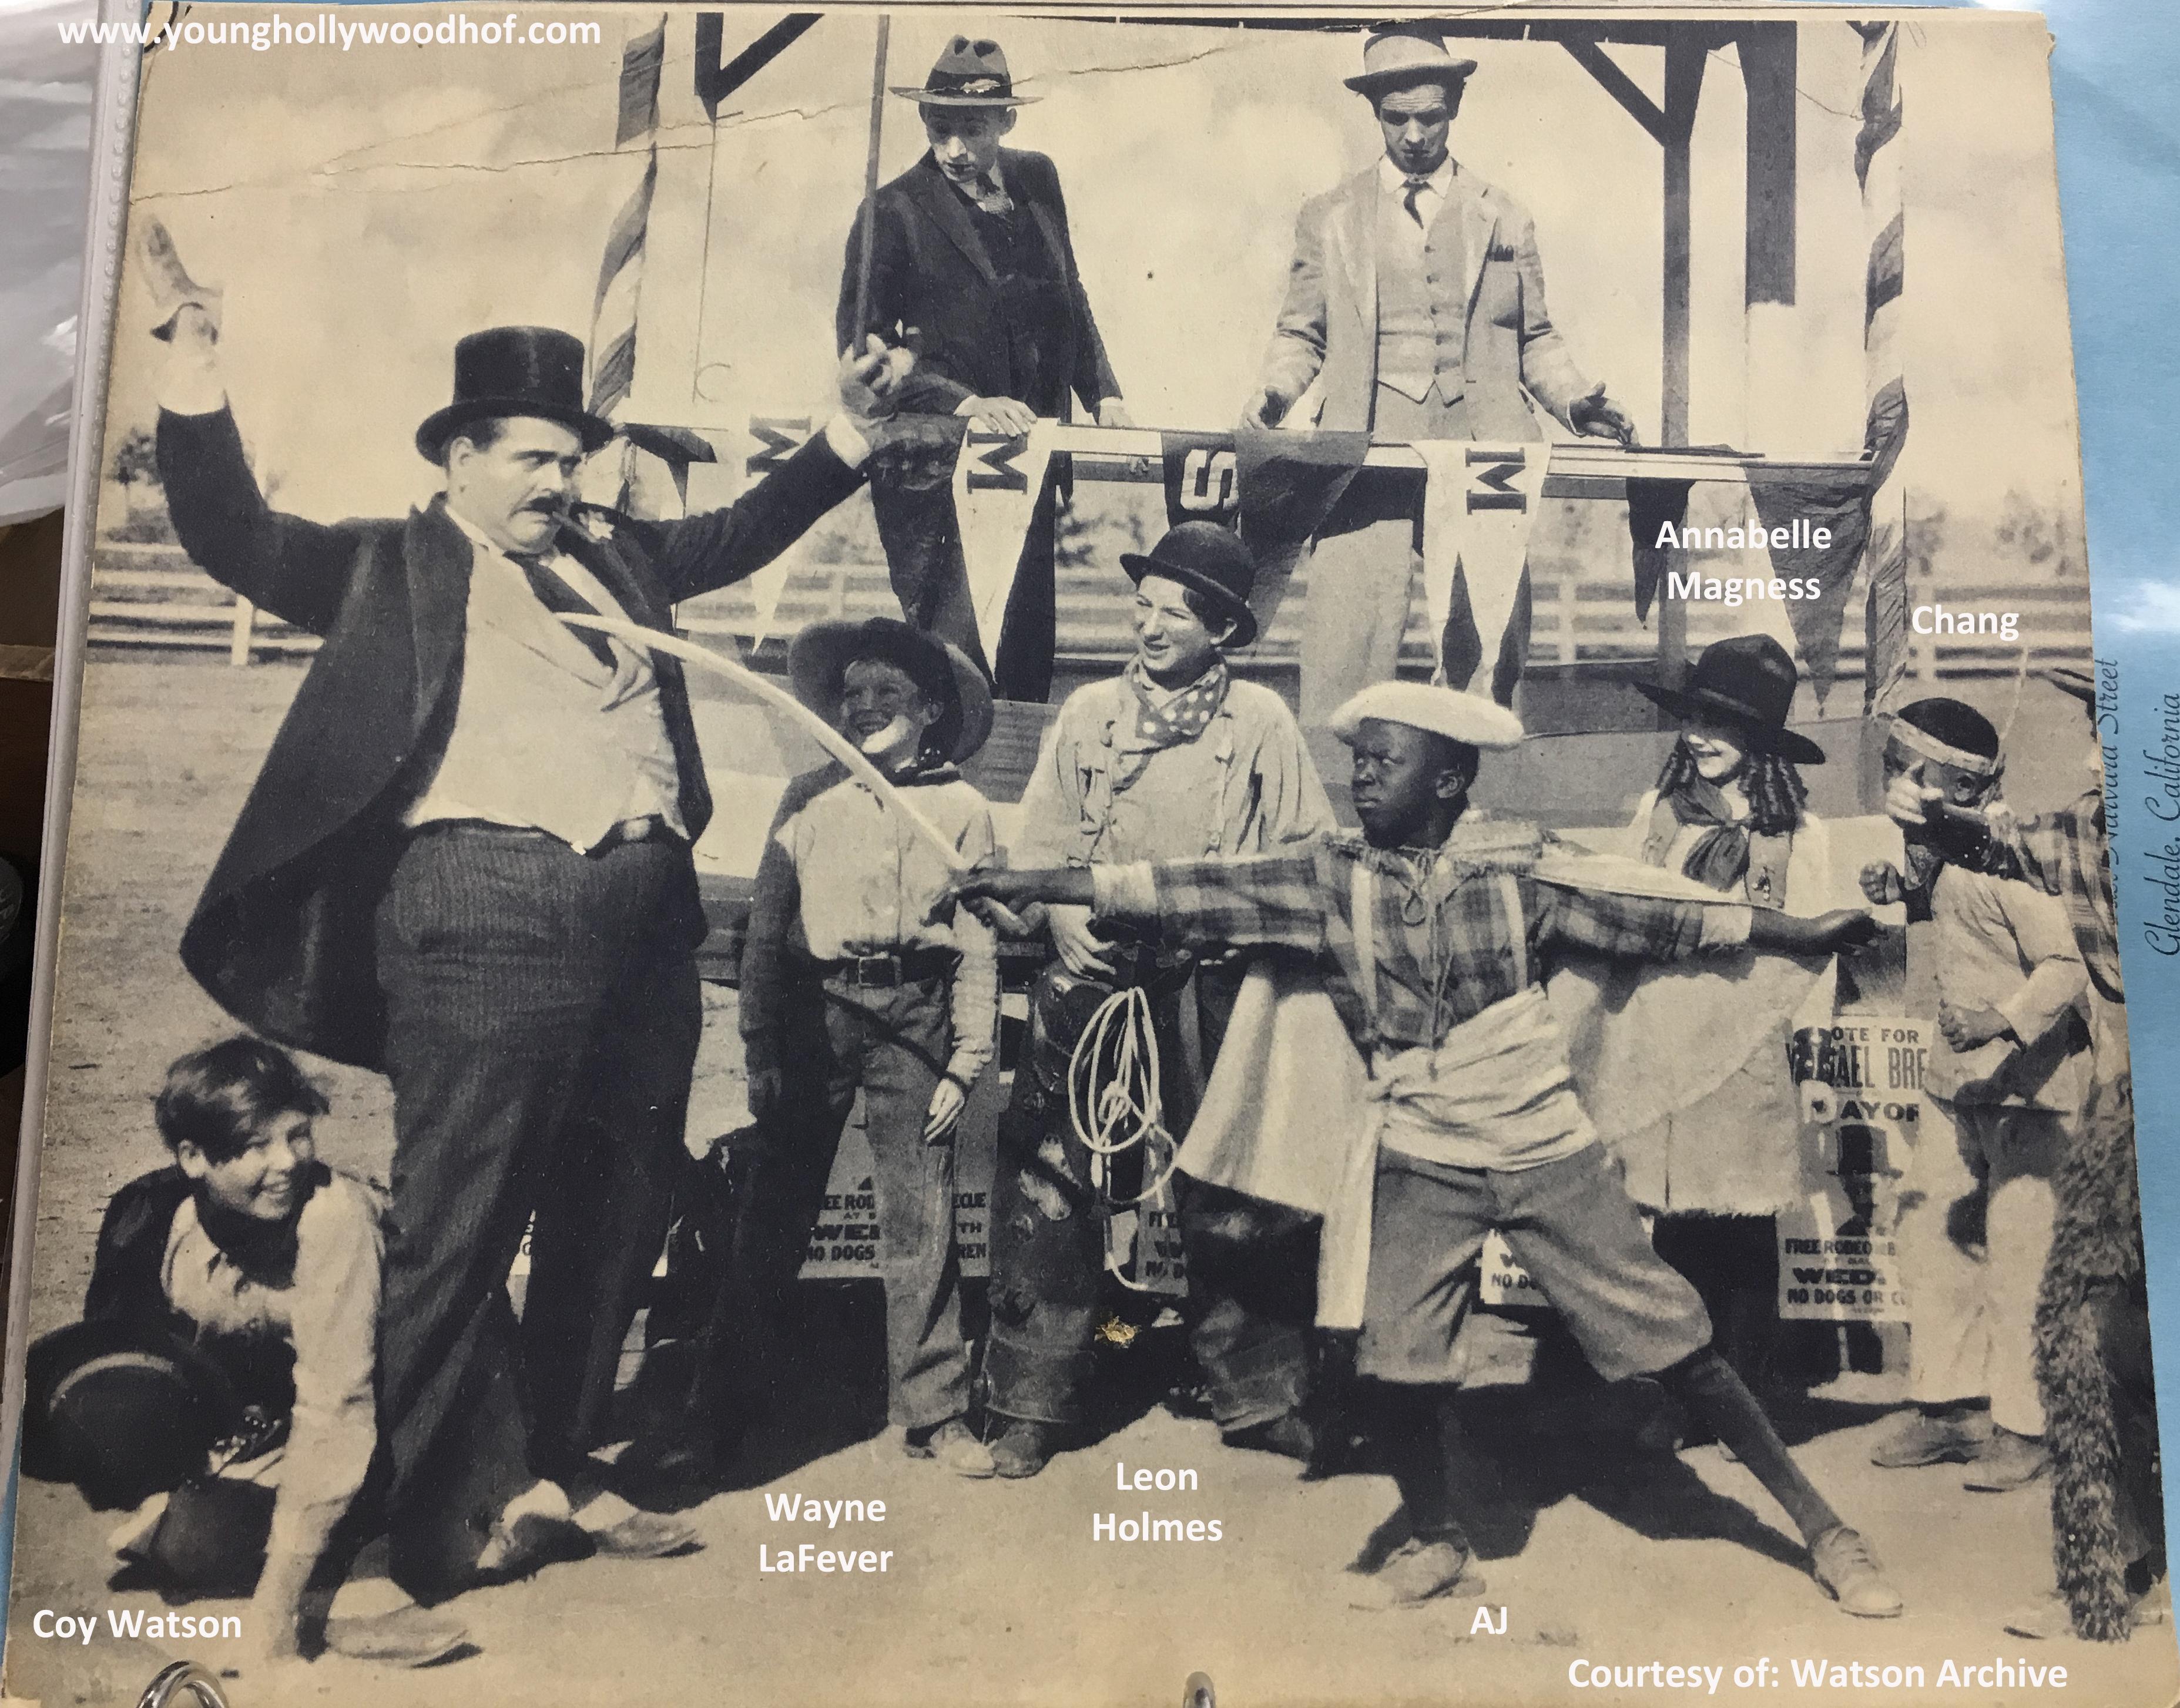 Leon Holmes, Bud Jamison, Annabelle Magnus, Coy Watson, and Wayne LaFever in Bear Knees (1928)